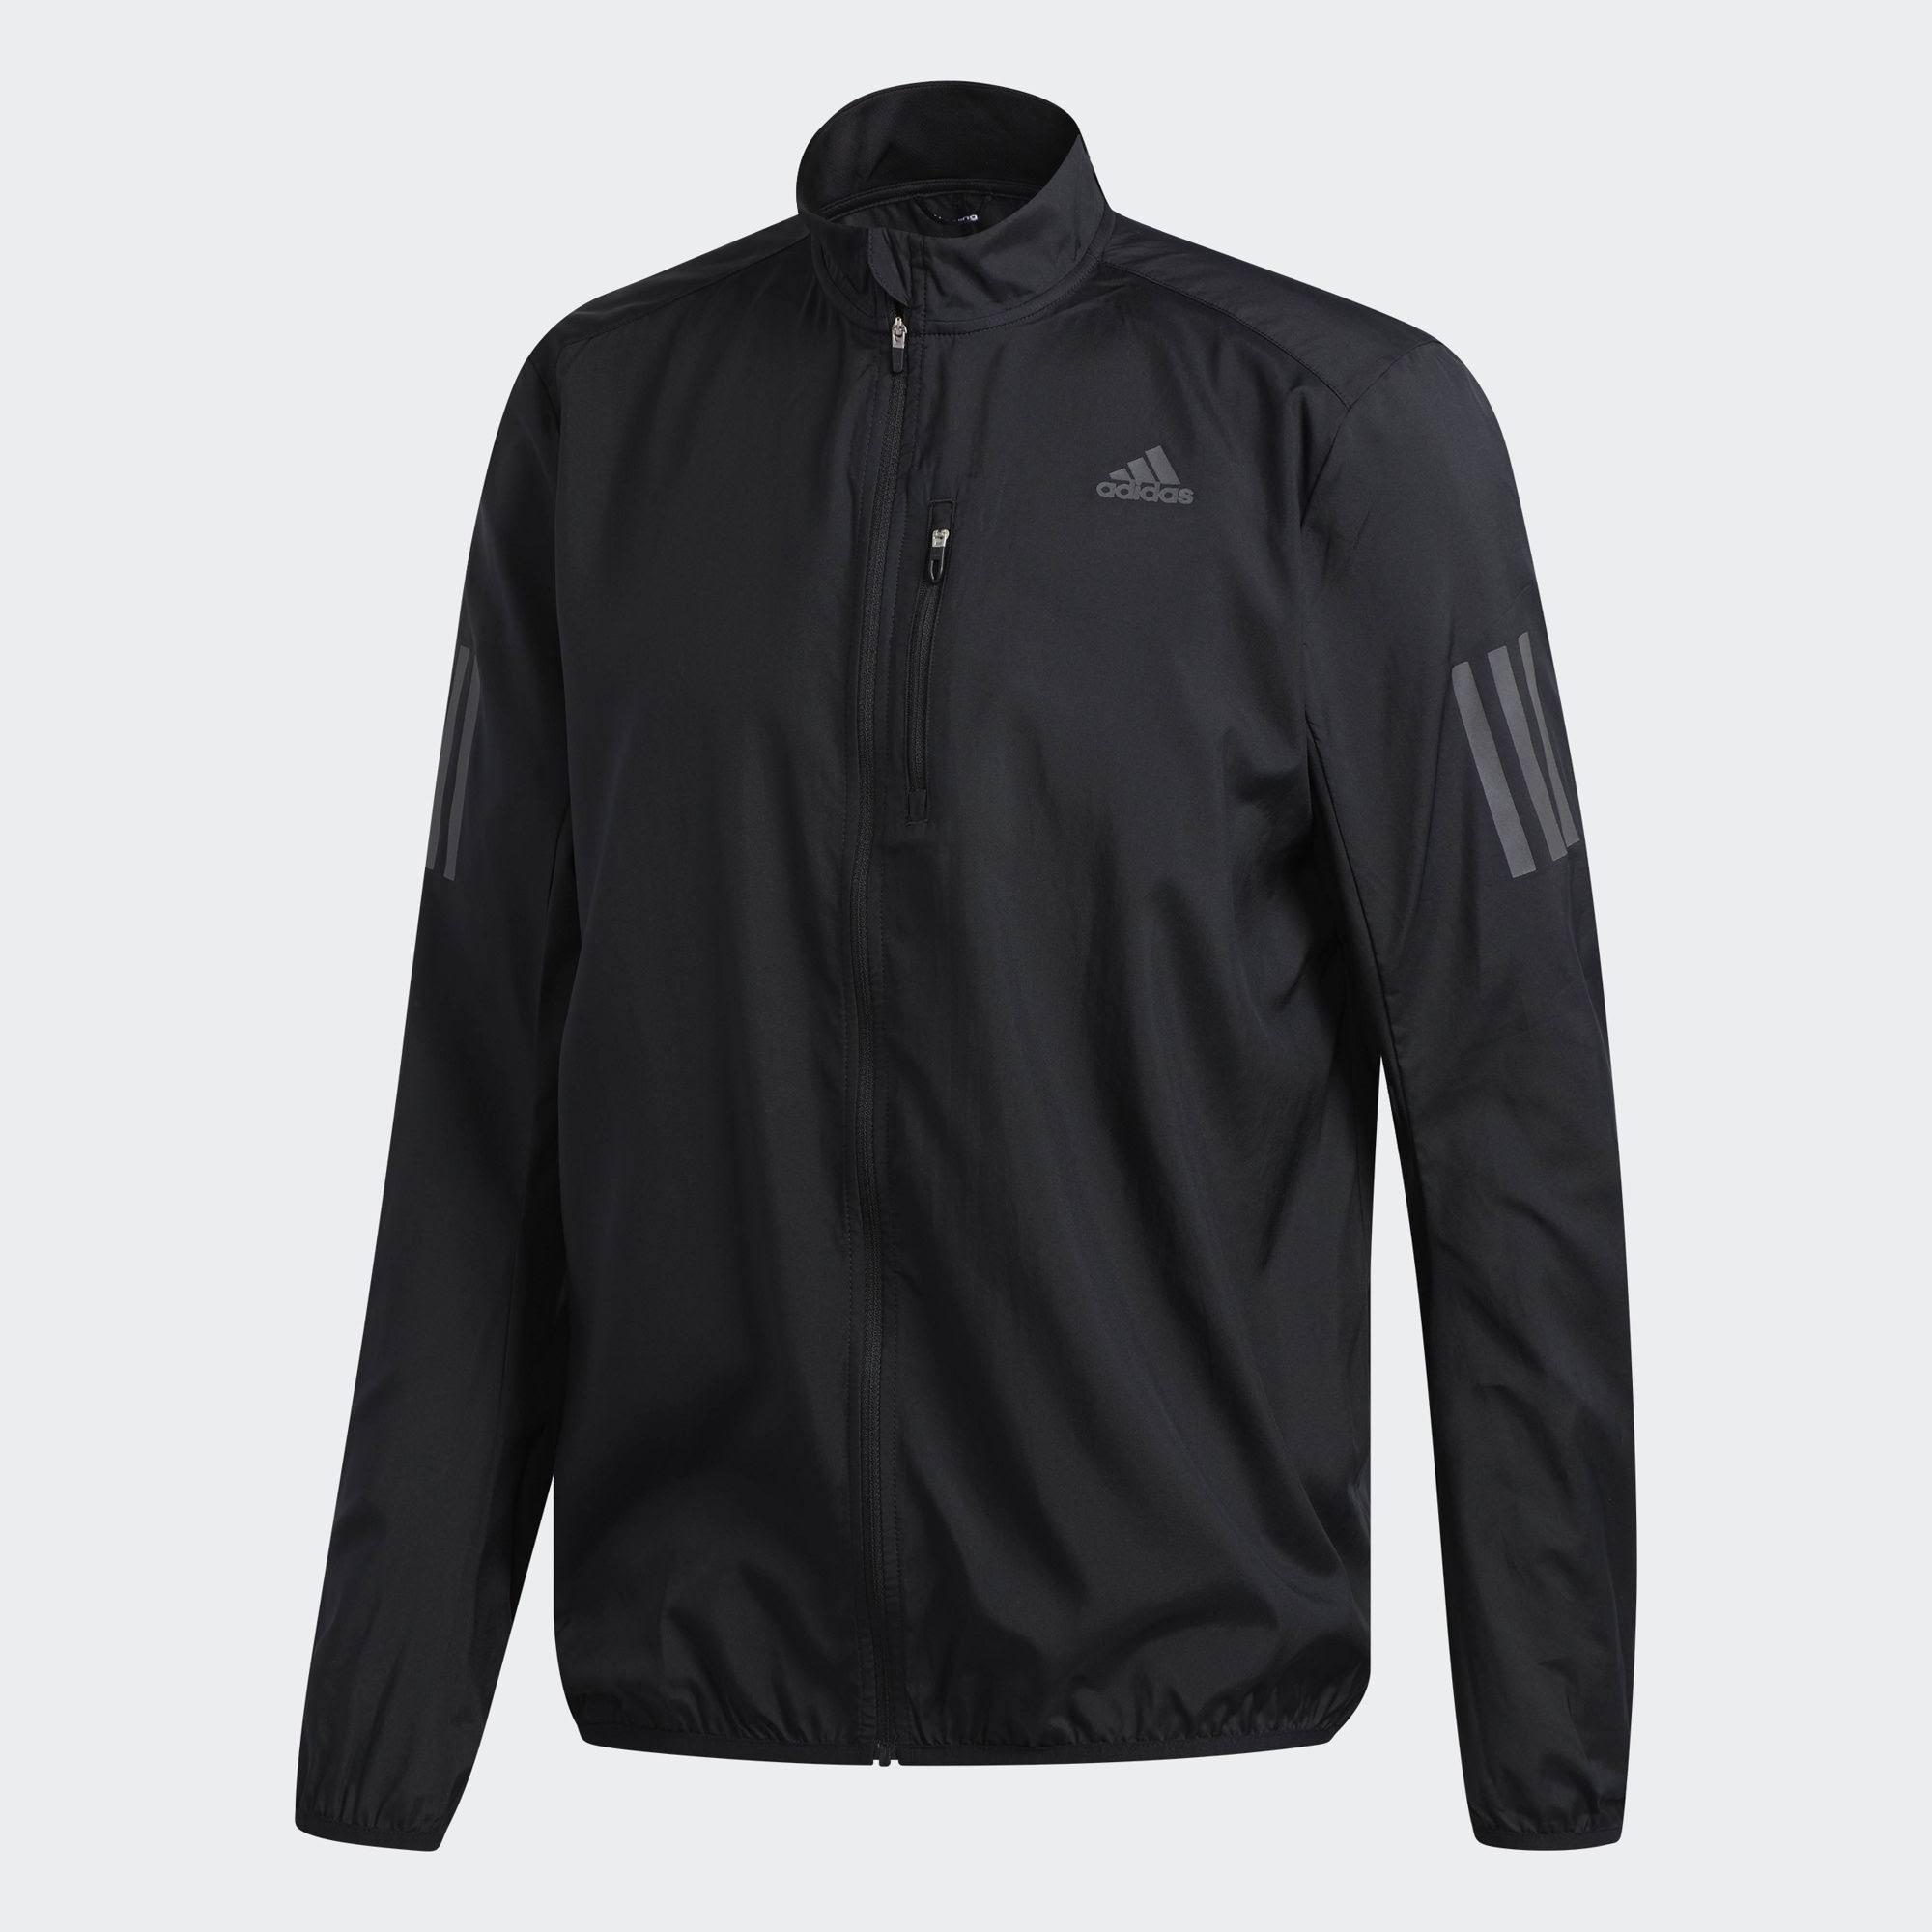 Men's Tamaño Negro Adidas Chaqueta Own Pequeño La Run Pqq4x6wd